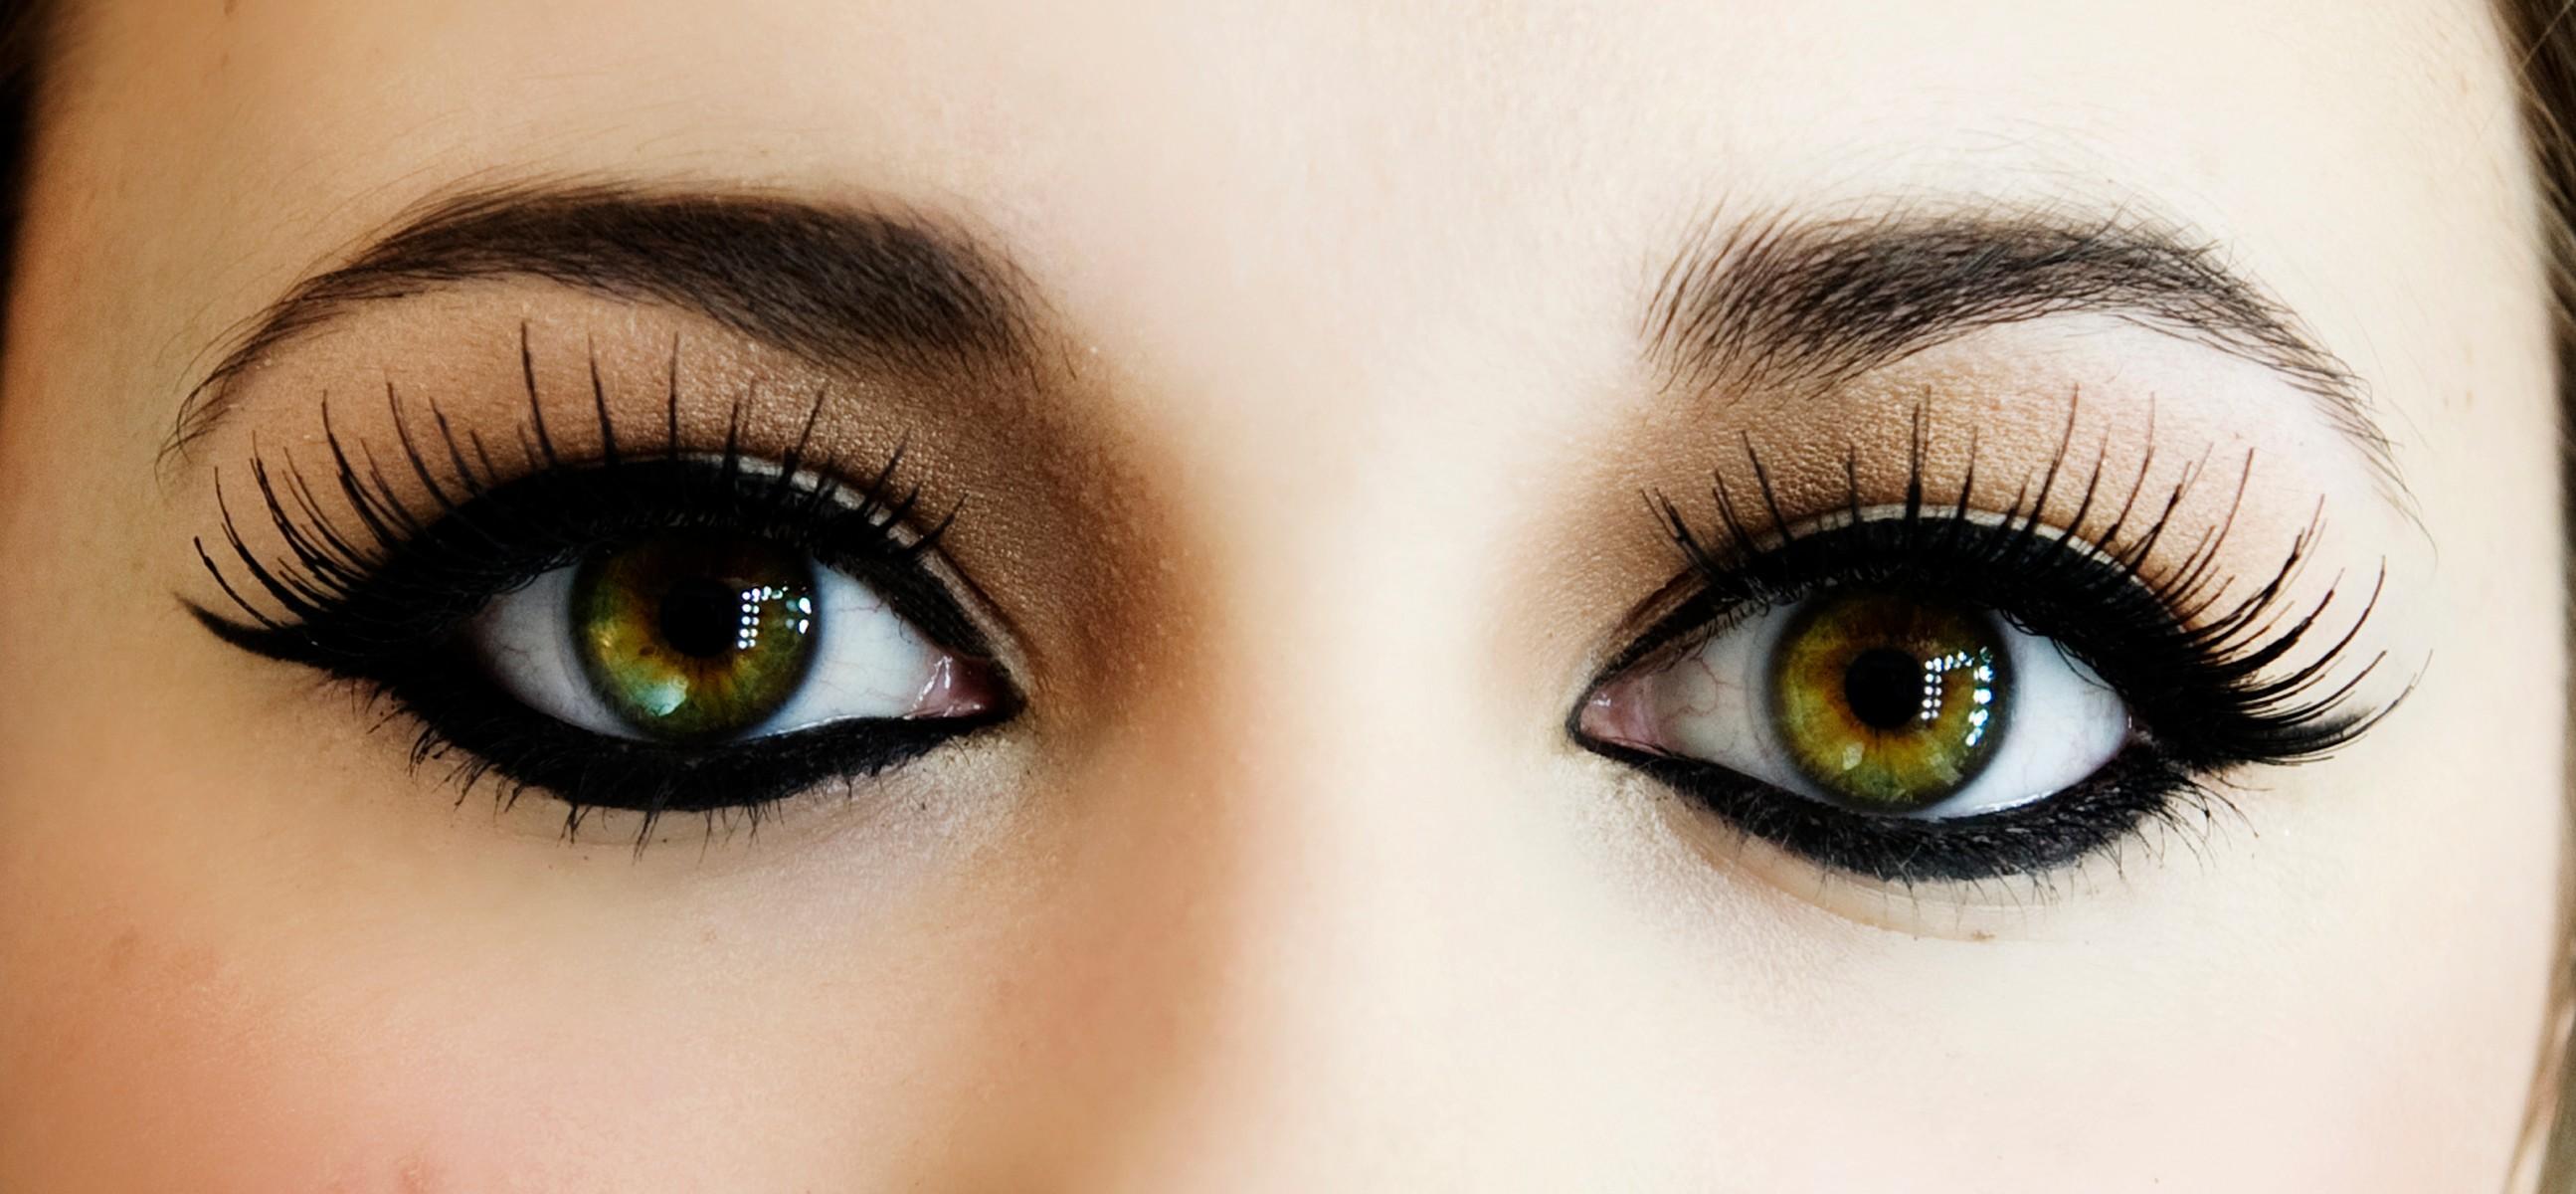 perfect-eye-makeup-false-eyelashes-long-eyelashes-eyelashes-Eye-makeup-eye-shadow-eyeliner-Makeup-03.jpg